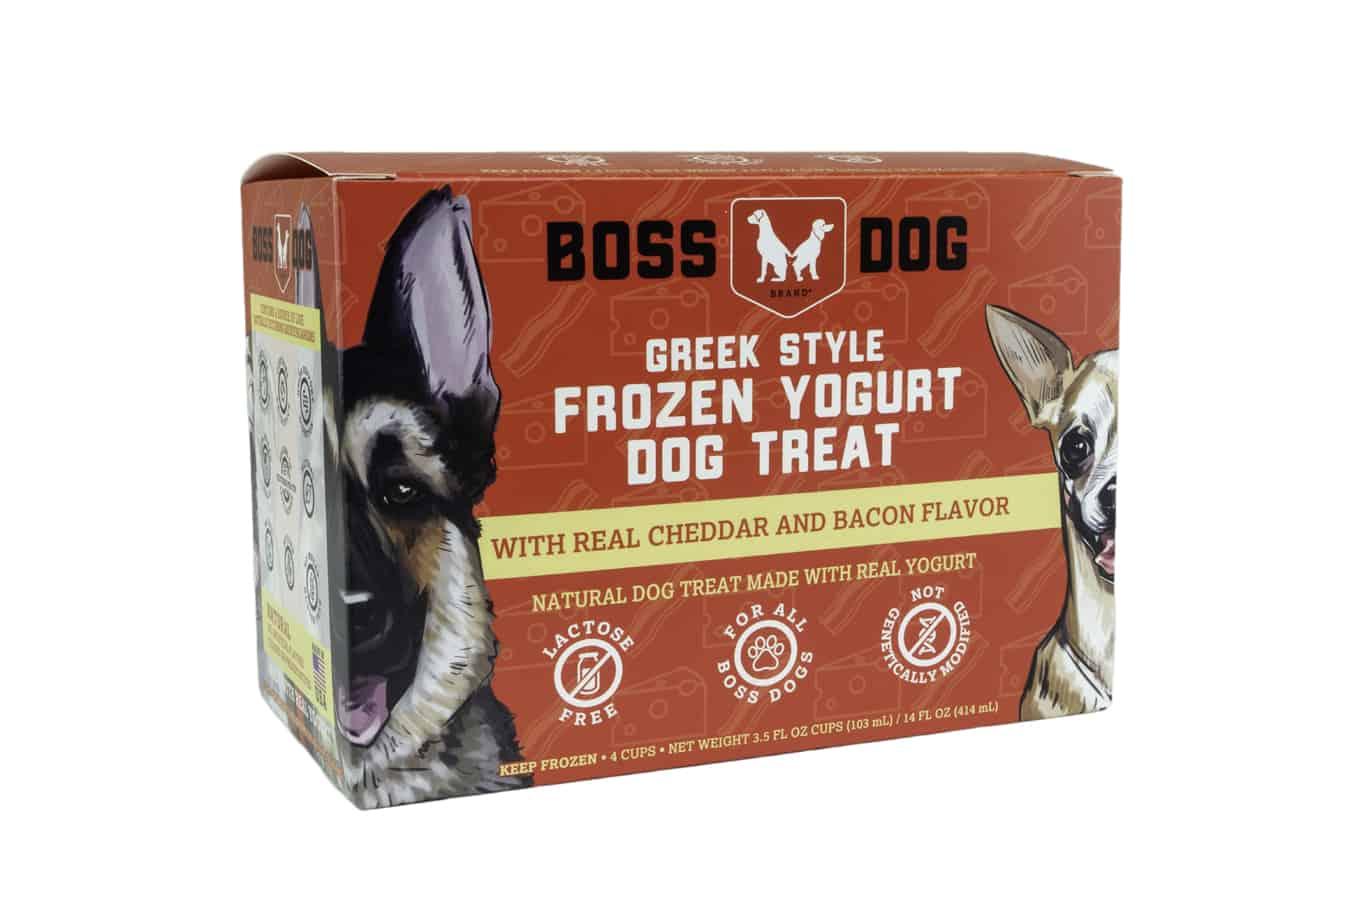 Boss Dog Cheddar & Bacon Frozen Yogurt Dog Treats, 3.5-oz, 4-pack